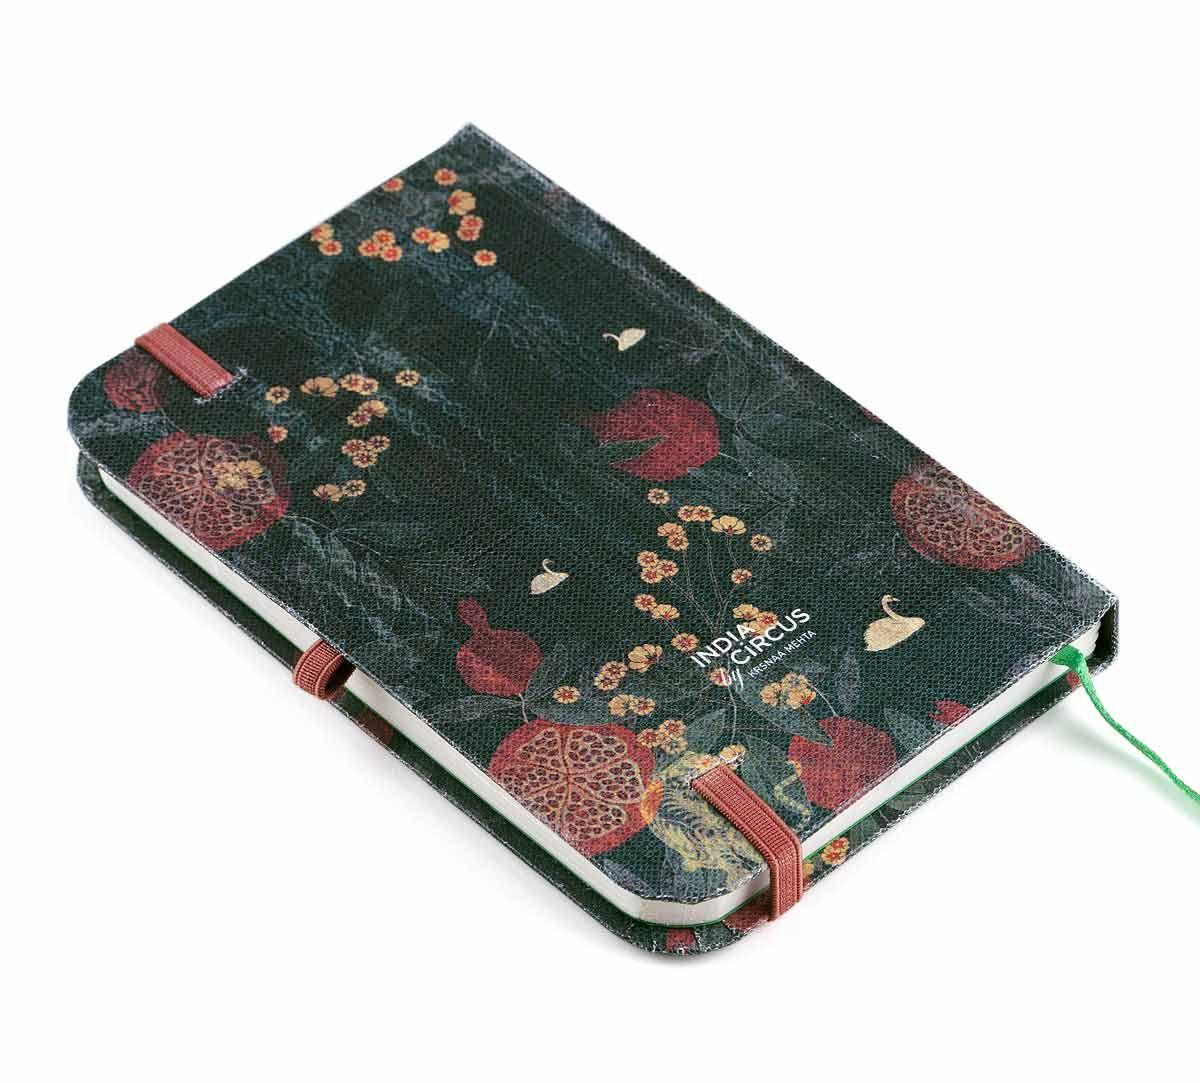 India Circus Lakeside Florist Pocket Diary